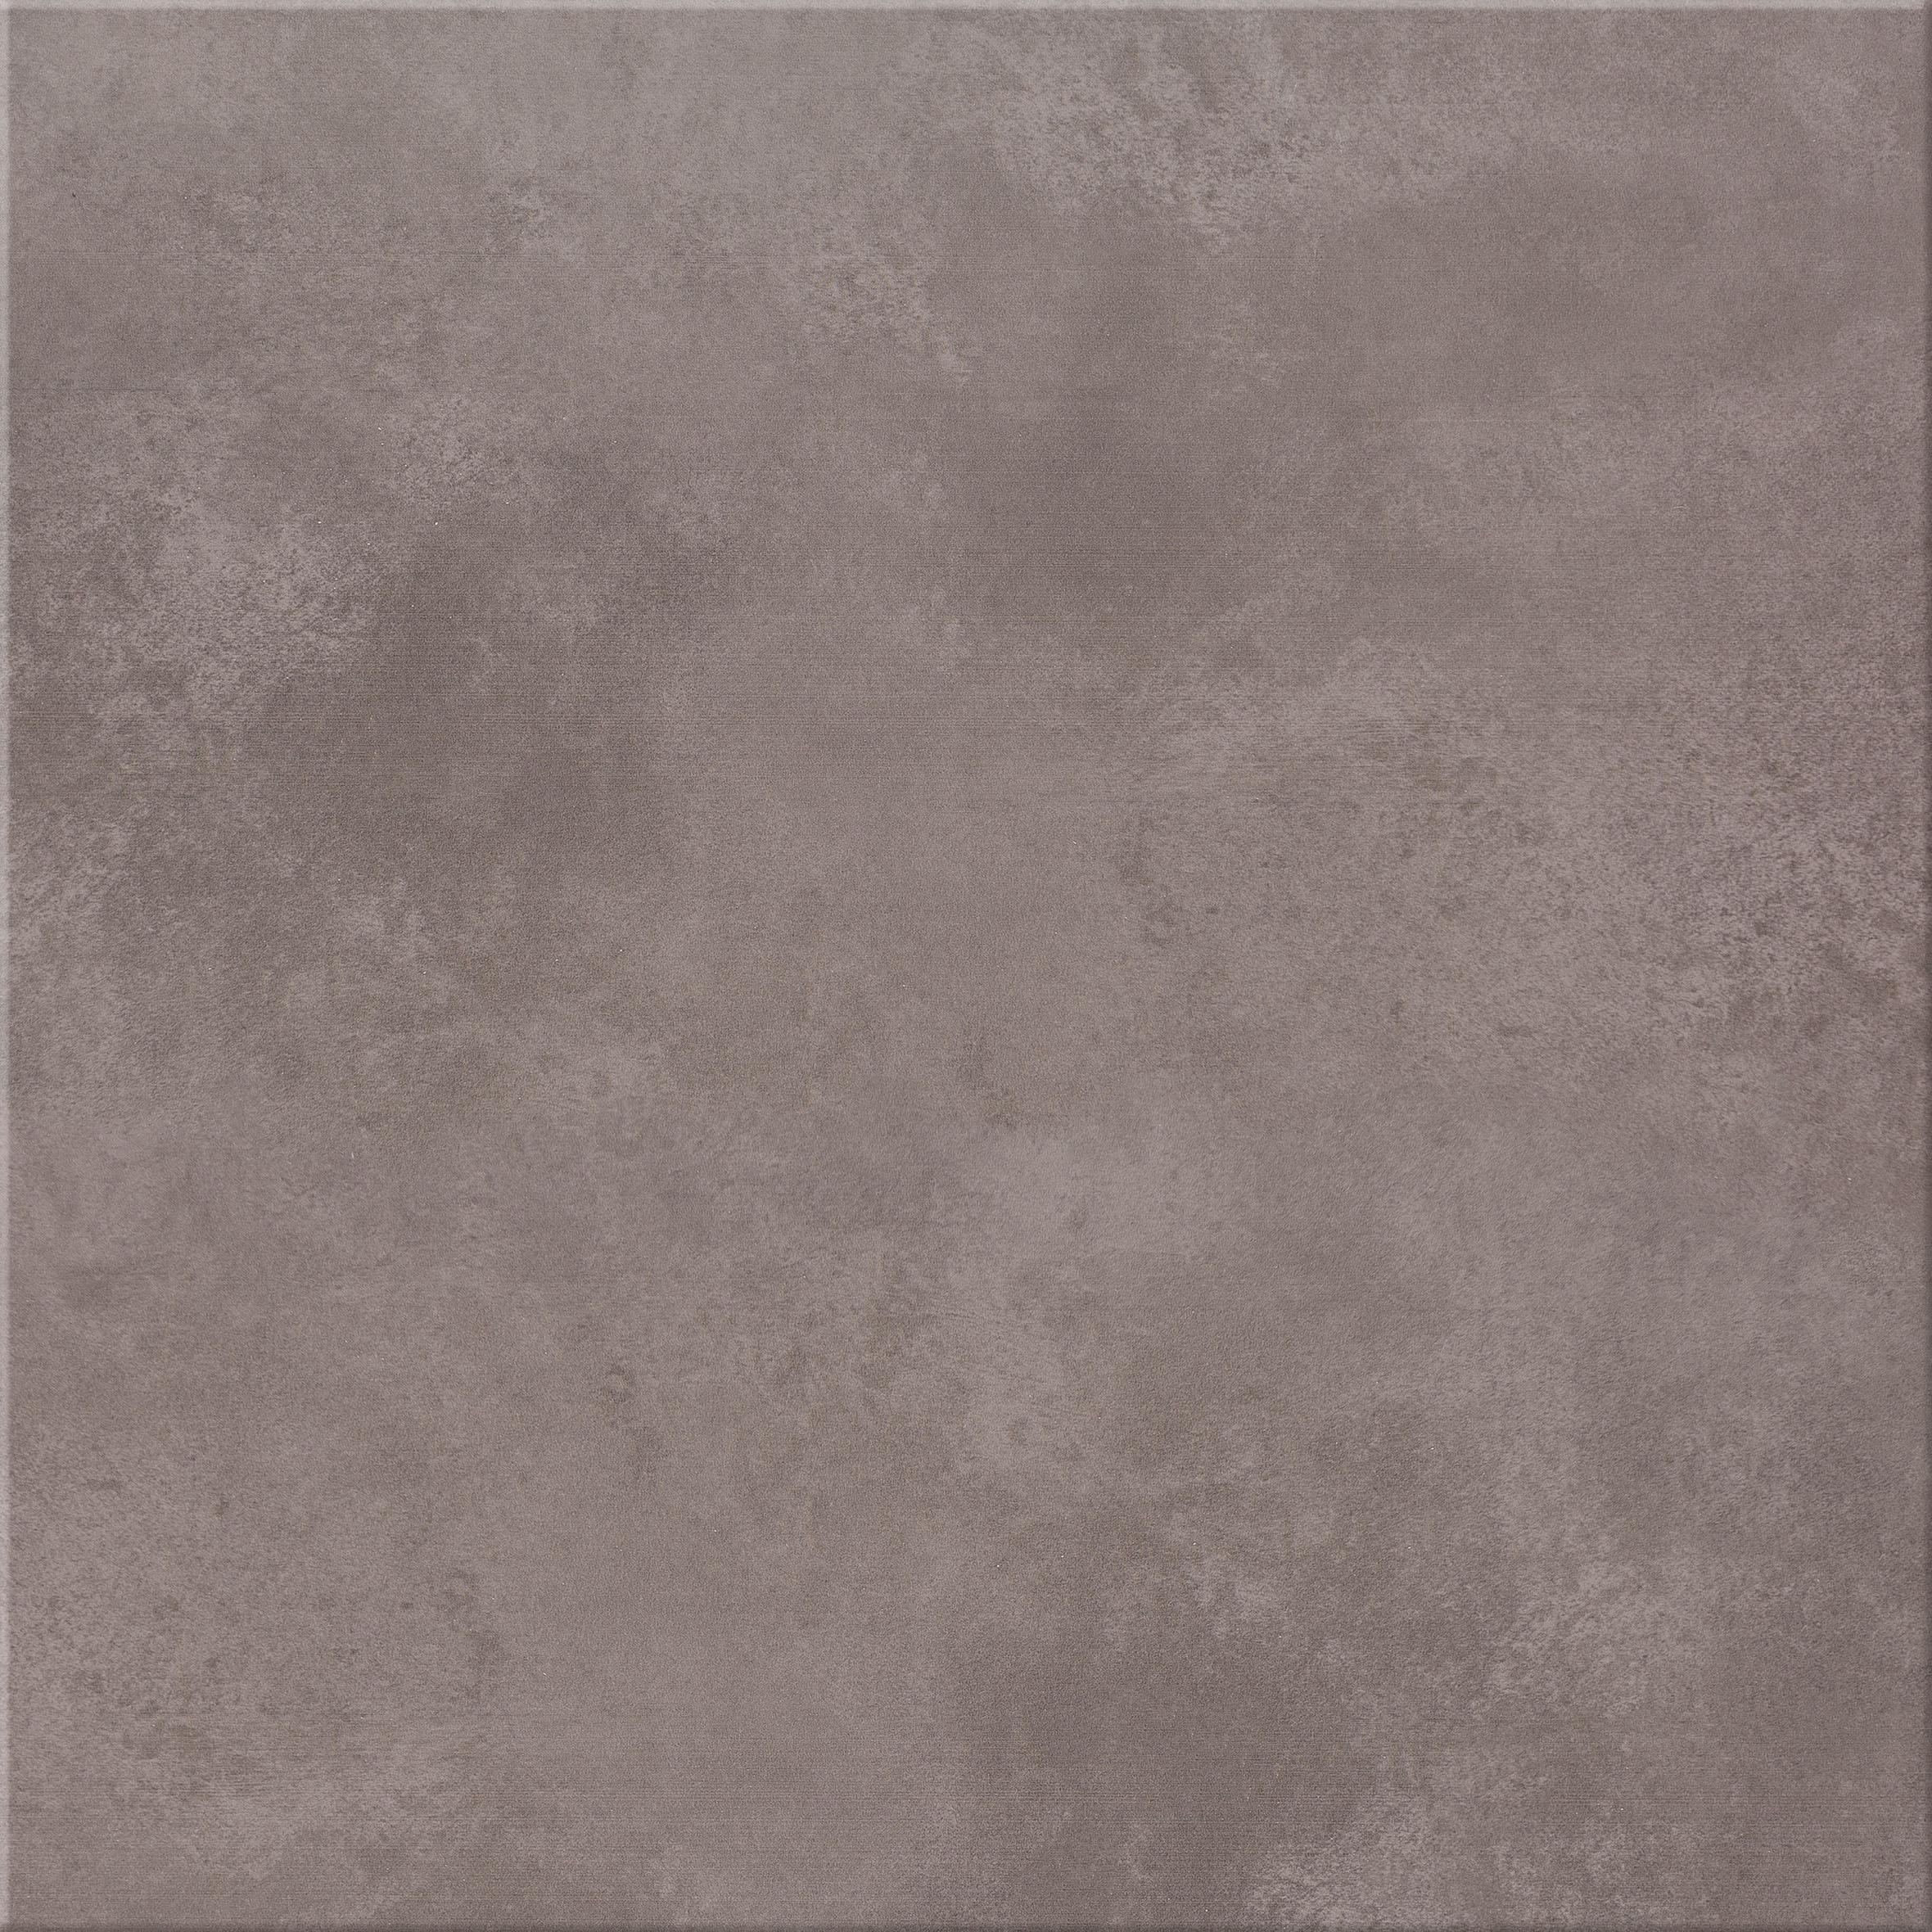 69b Deri graphit W347-008-1 33,3x33,3 - Hansas Plaadimaailm